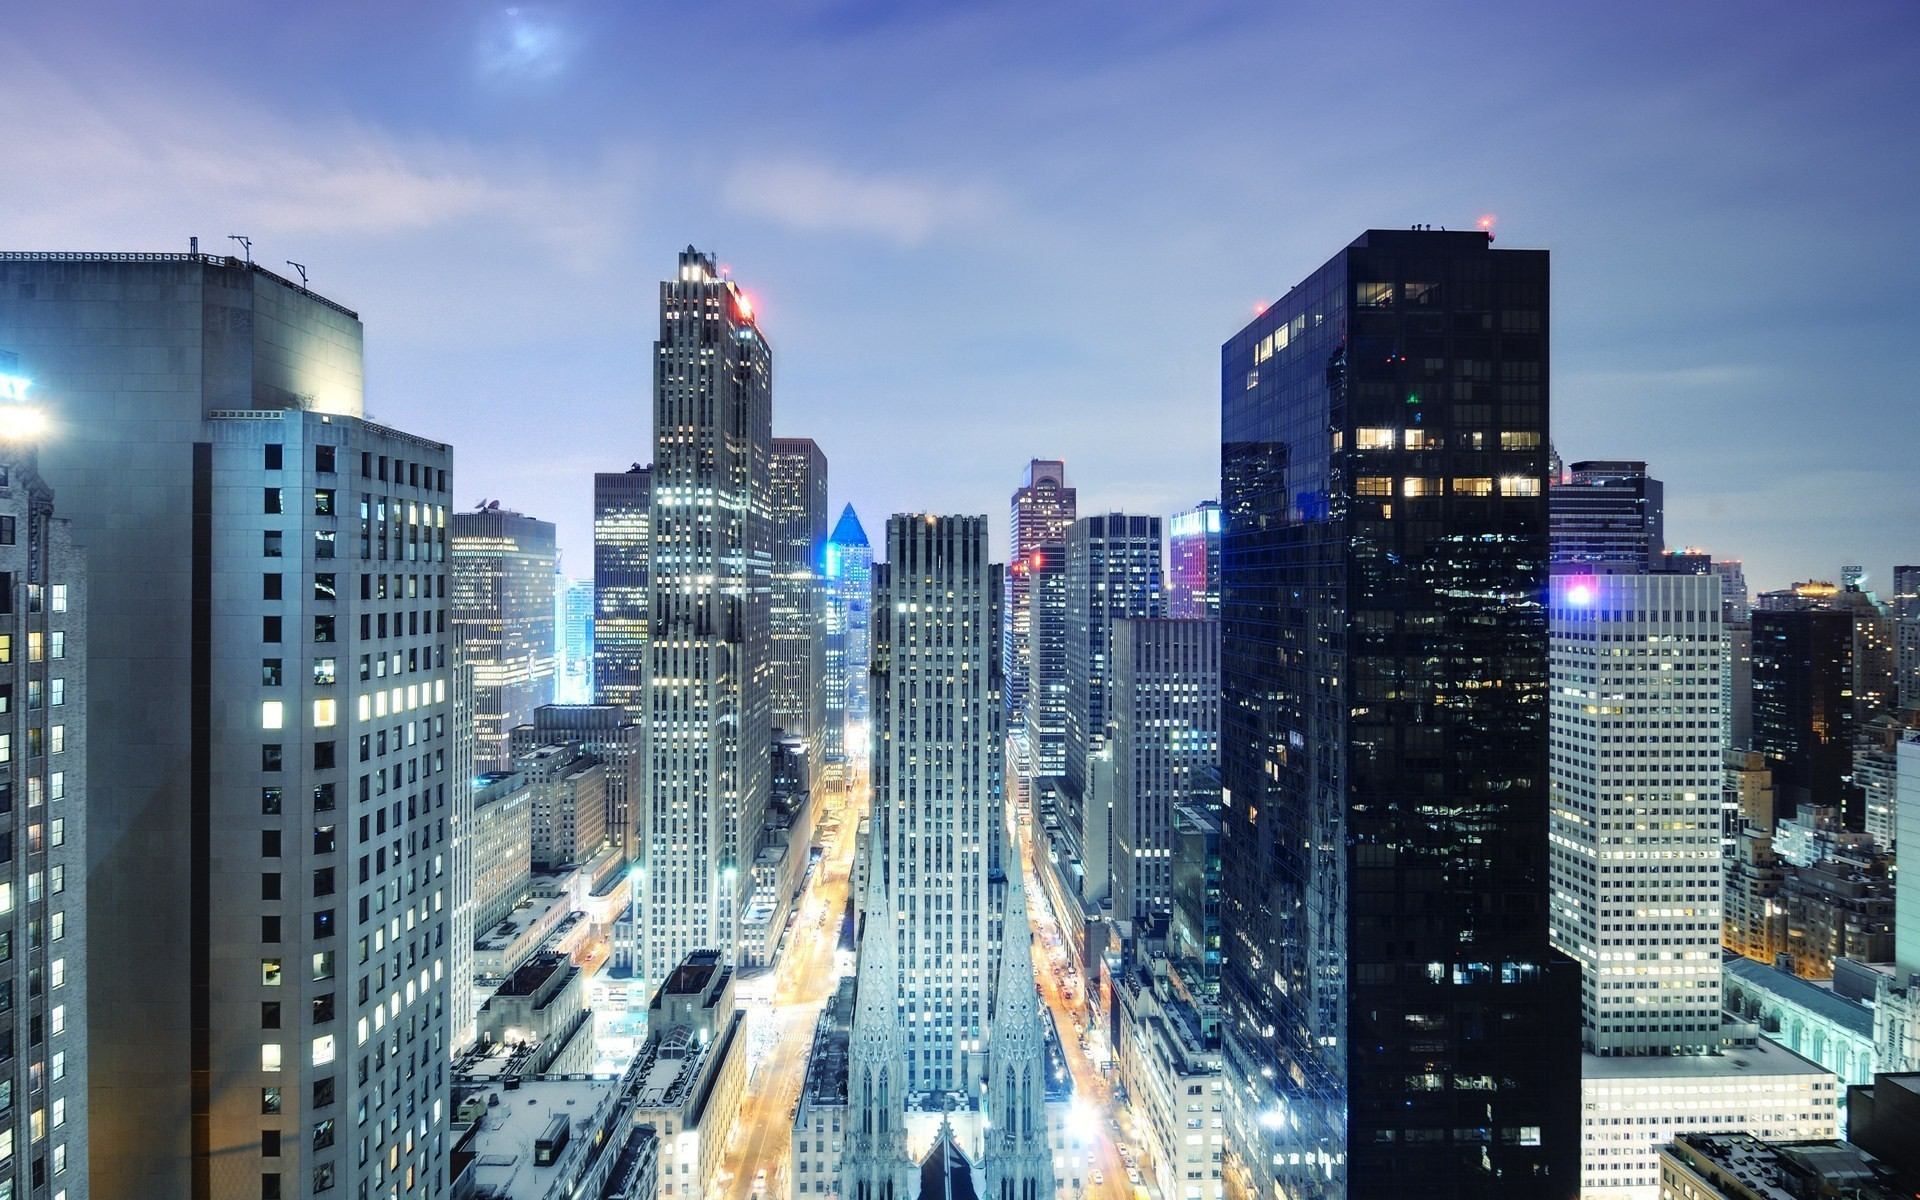 Fantastic City Buildings Wallpaper 43930 1920x1200px 1920x1200